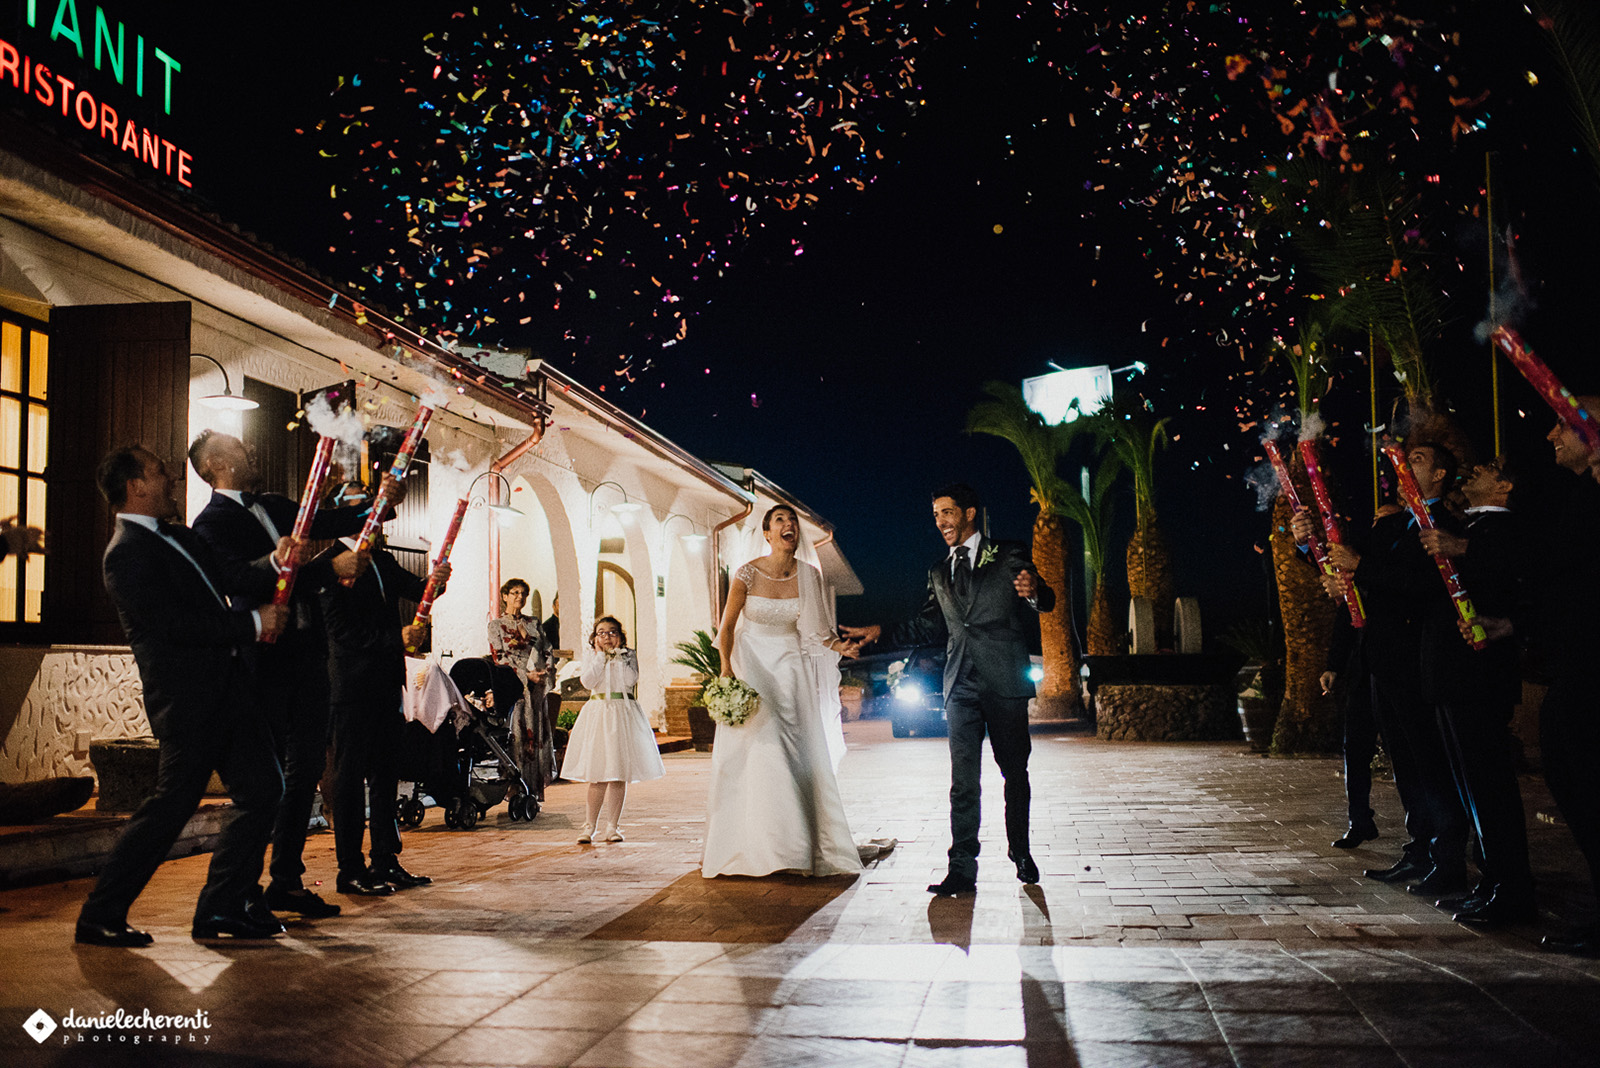 Matrimonio -Ristorante Tanit - Ristorante a Carbonia dal 1981